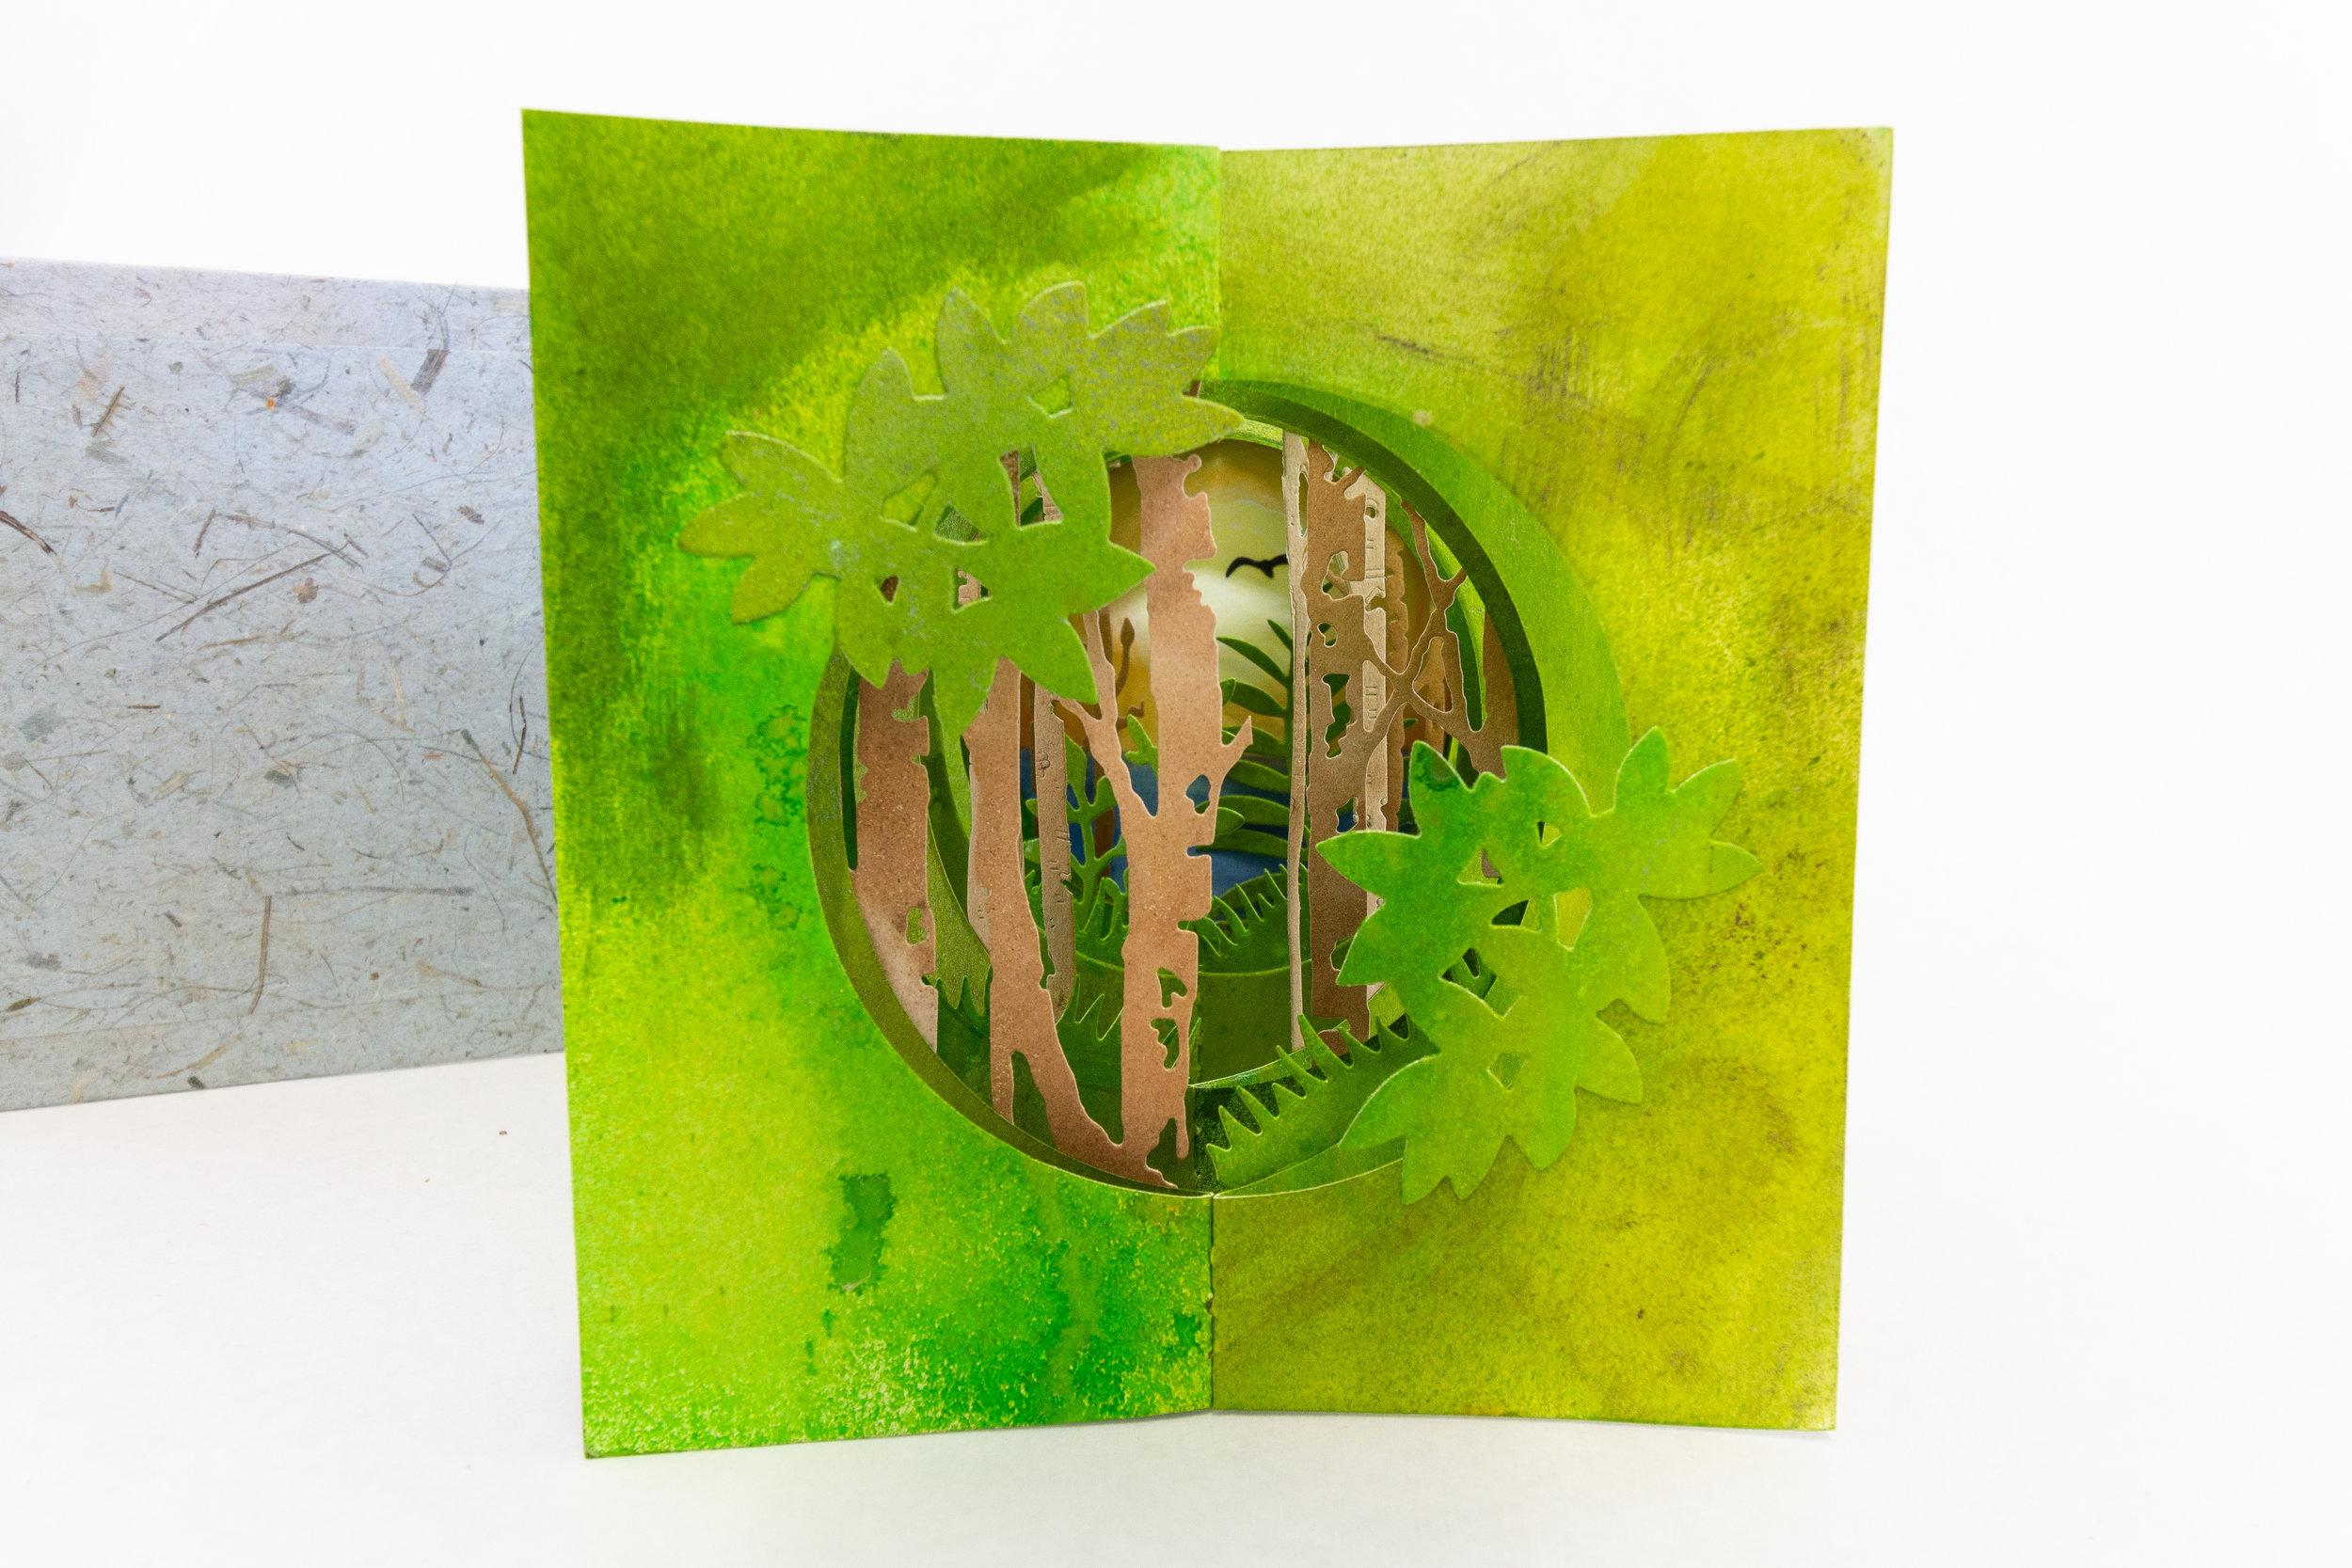 Jamila Rufaro, Double Accordion Tunnel Book, Mixed Media, paint, ink, watercolor, 2019, $180, Palo Alto, CA